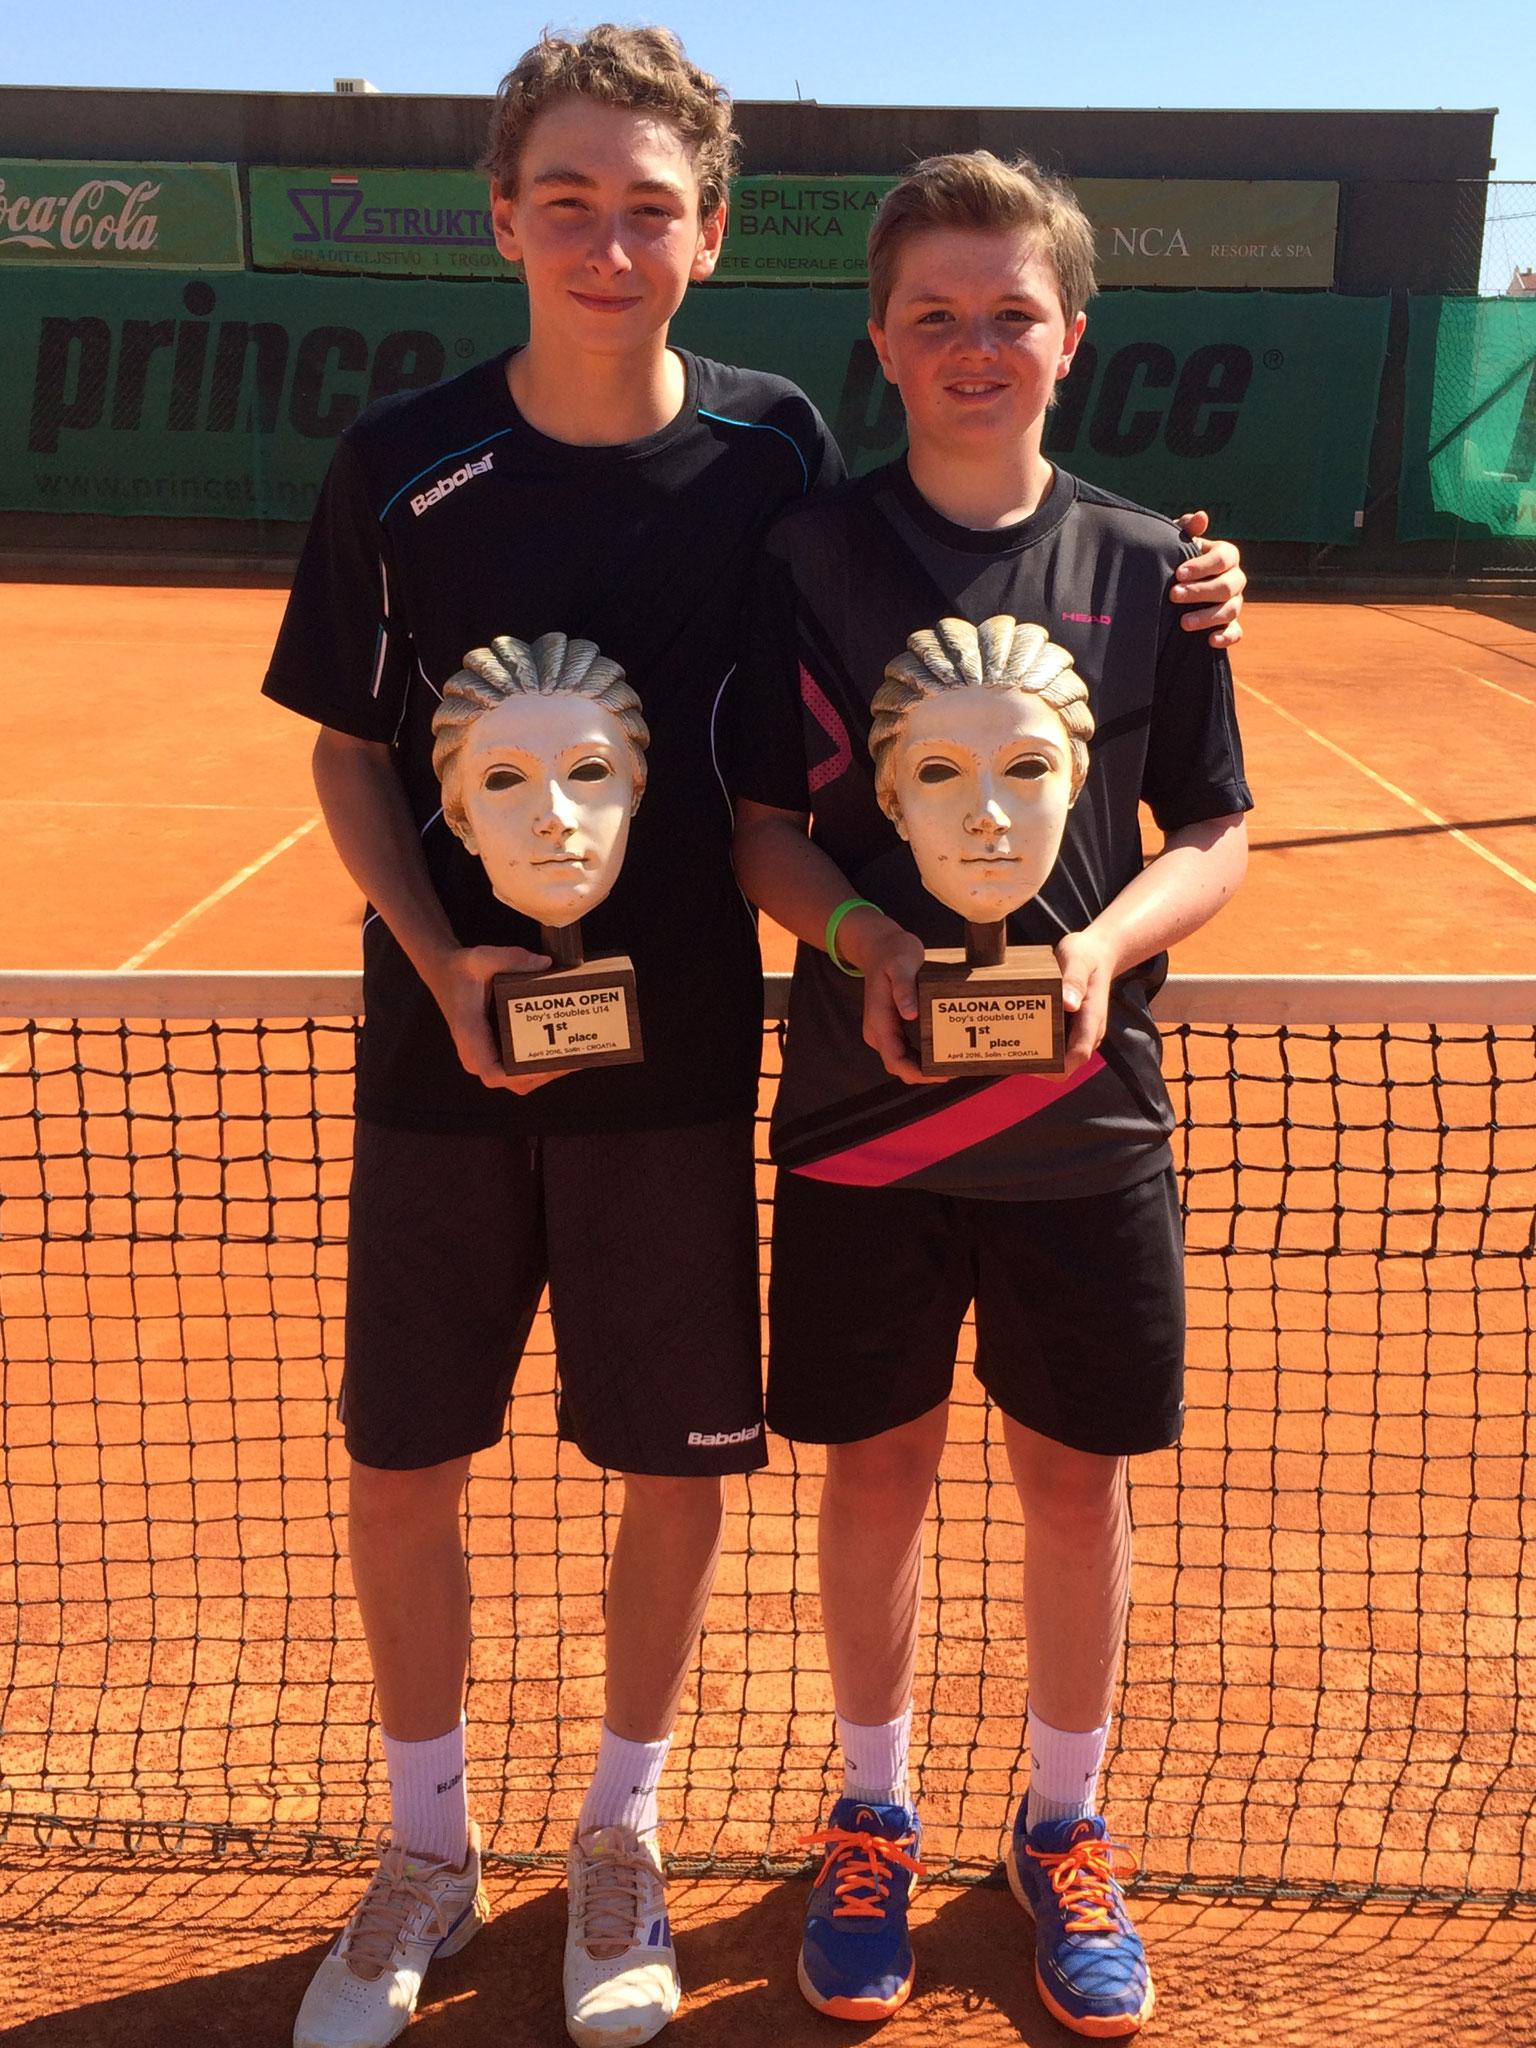 Mit seinem Doppelpartner Romain Faucon aus Belgien.